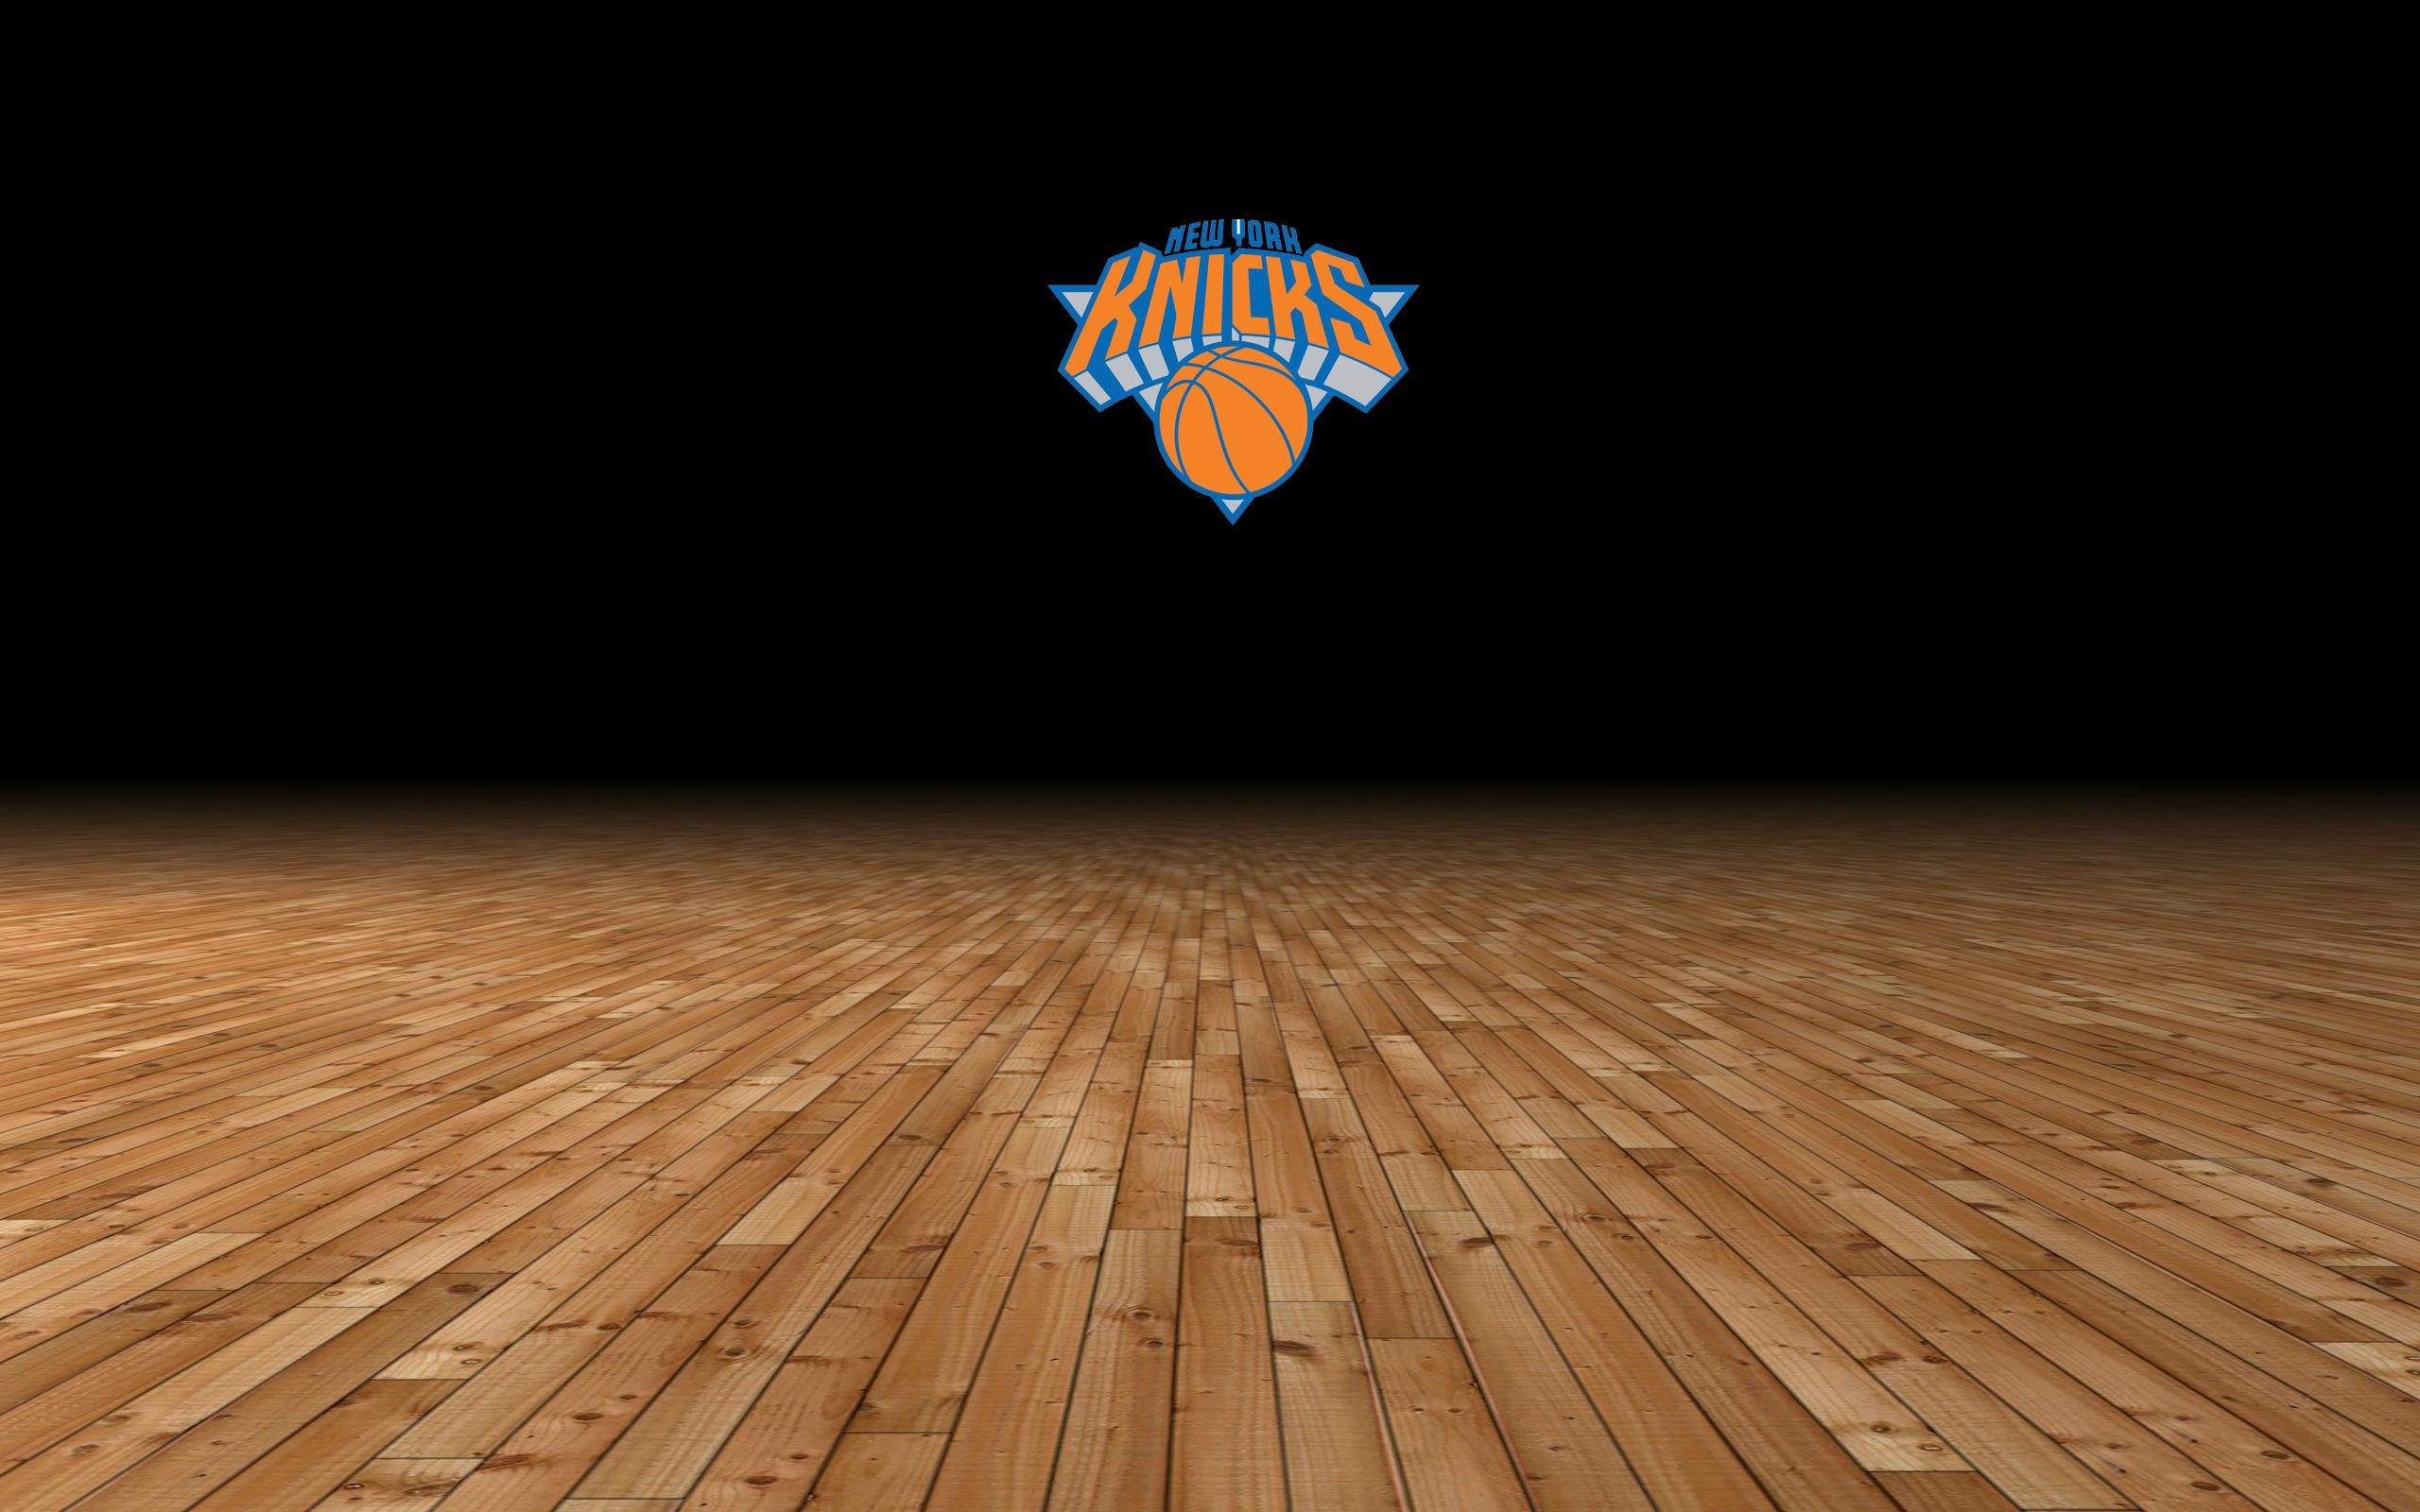 New York Knicks Logo Wallpapers HD 2560x1600